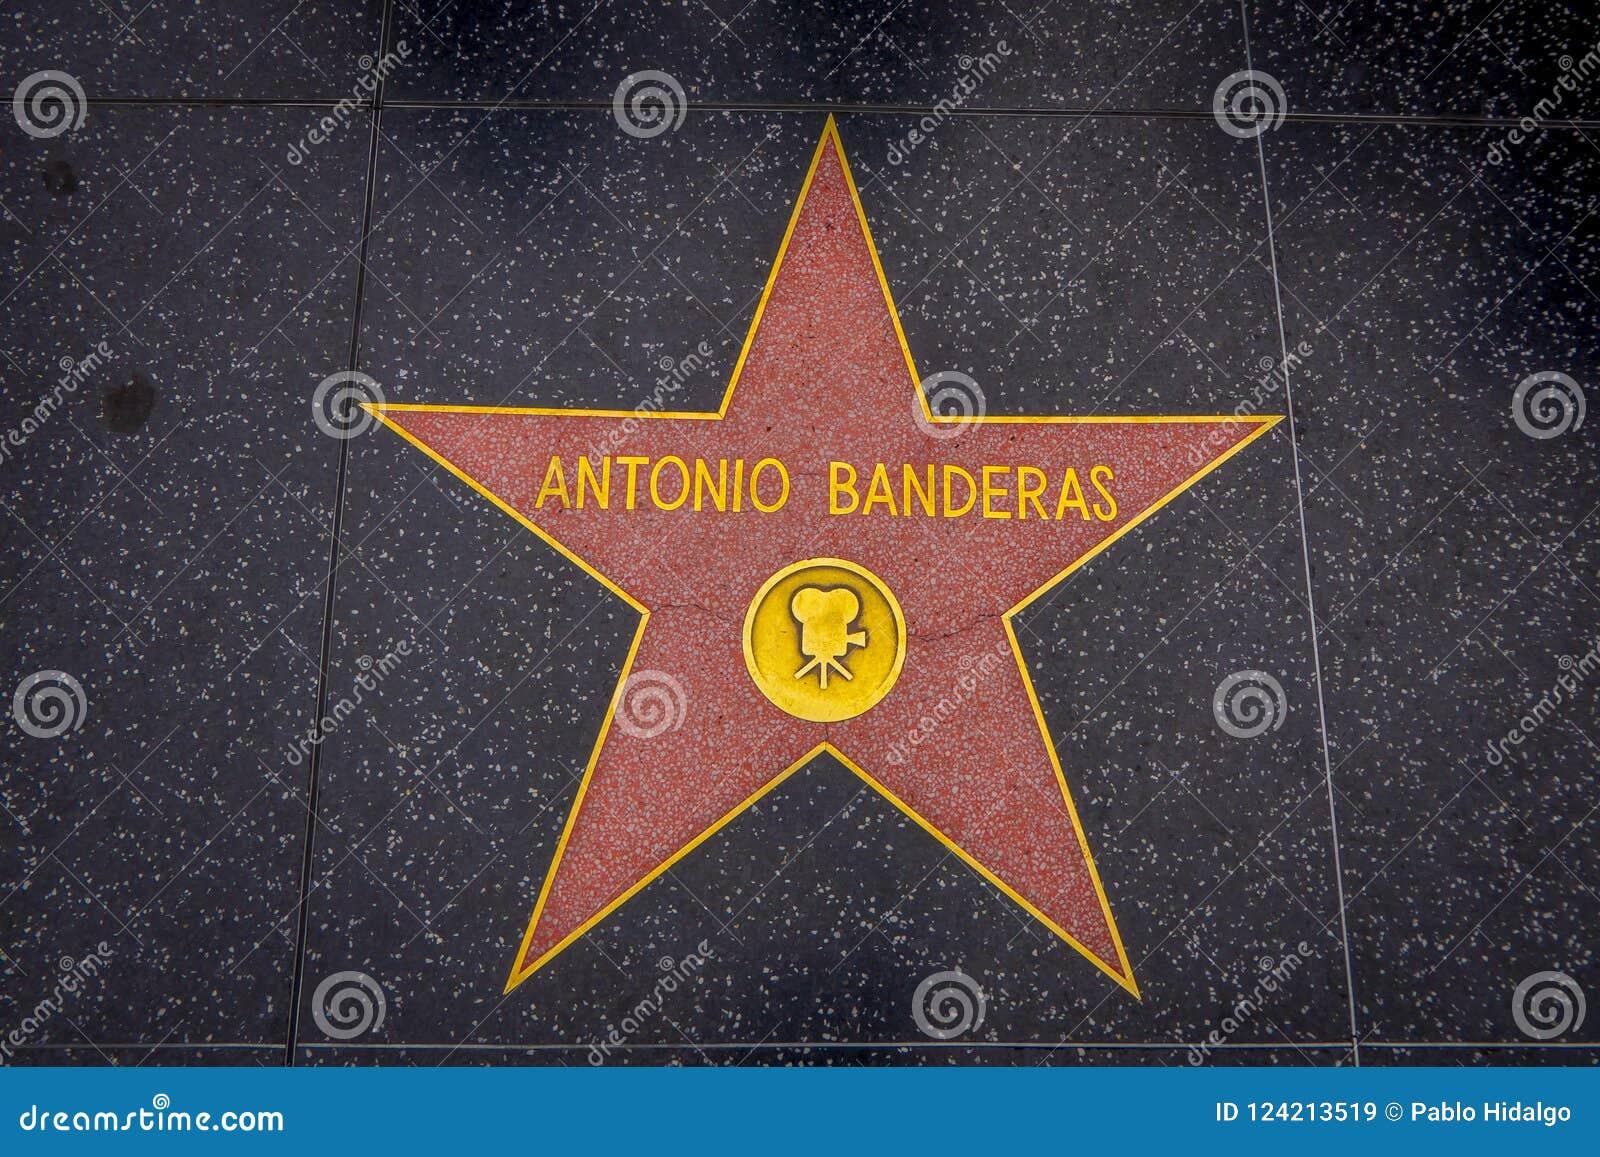 Los Angeles, Californië, de V.S., 15 JUNI, 2018: Openluchtmening van de ster van Antonio Banderas ` op Hollywood-Gang van Bekendh